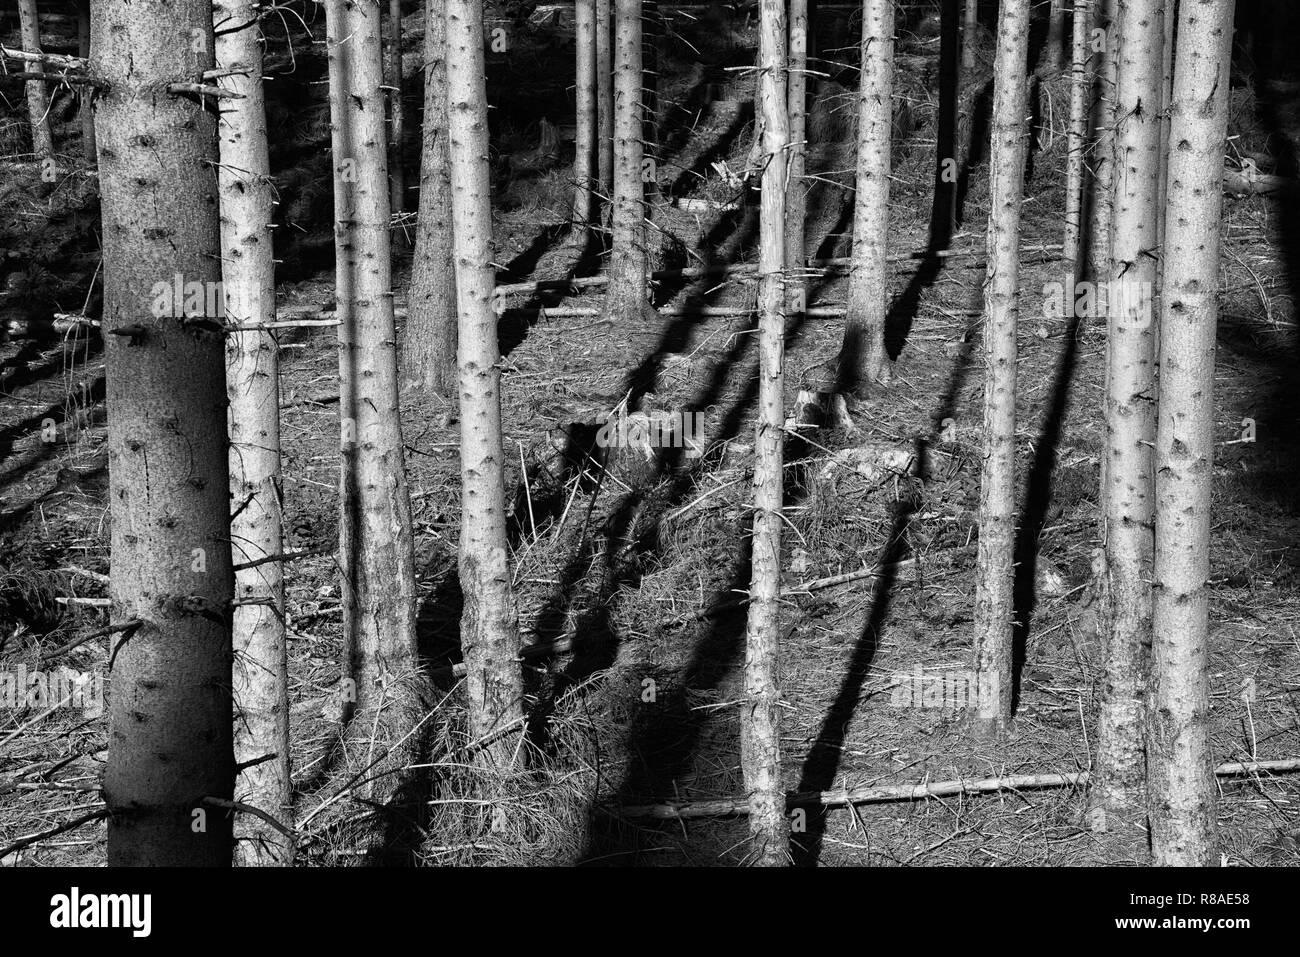 Coniferous forest near Bad Karlshafen, Upper Weser Valley,  Weser Uplands, Weserbergland, Hesse, Germany, Europe - Stock Image